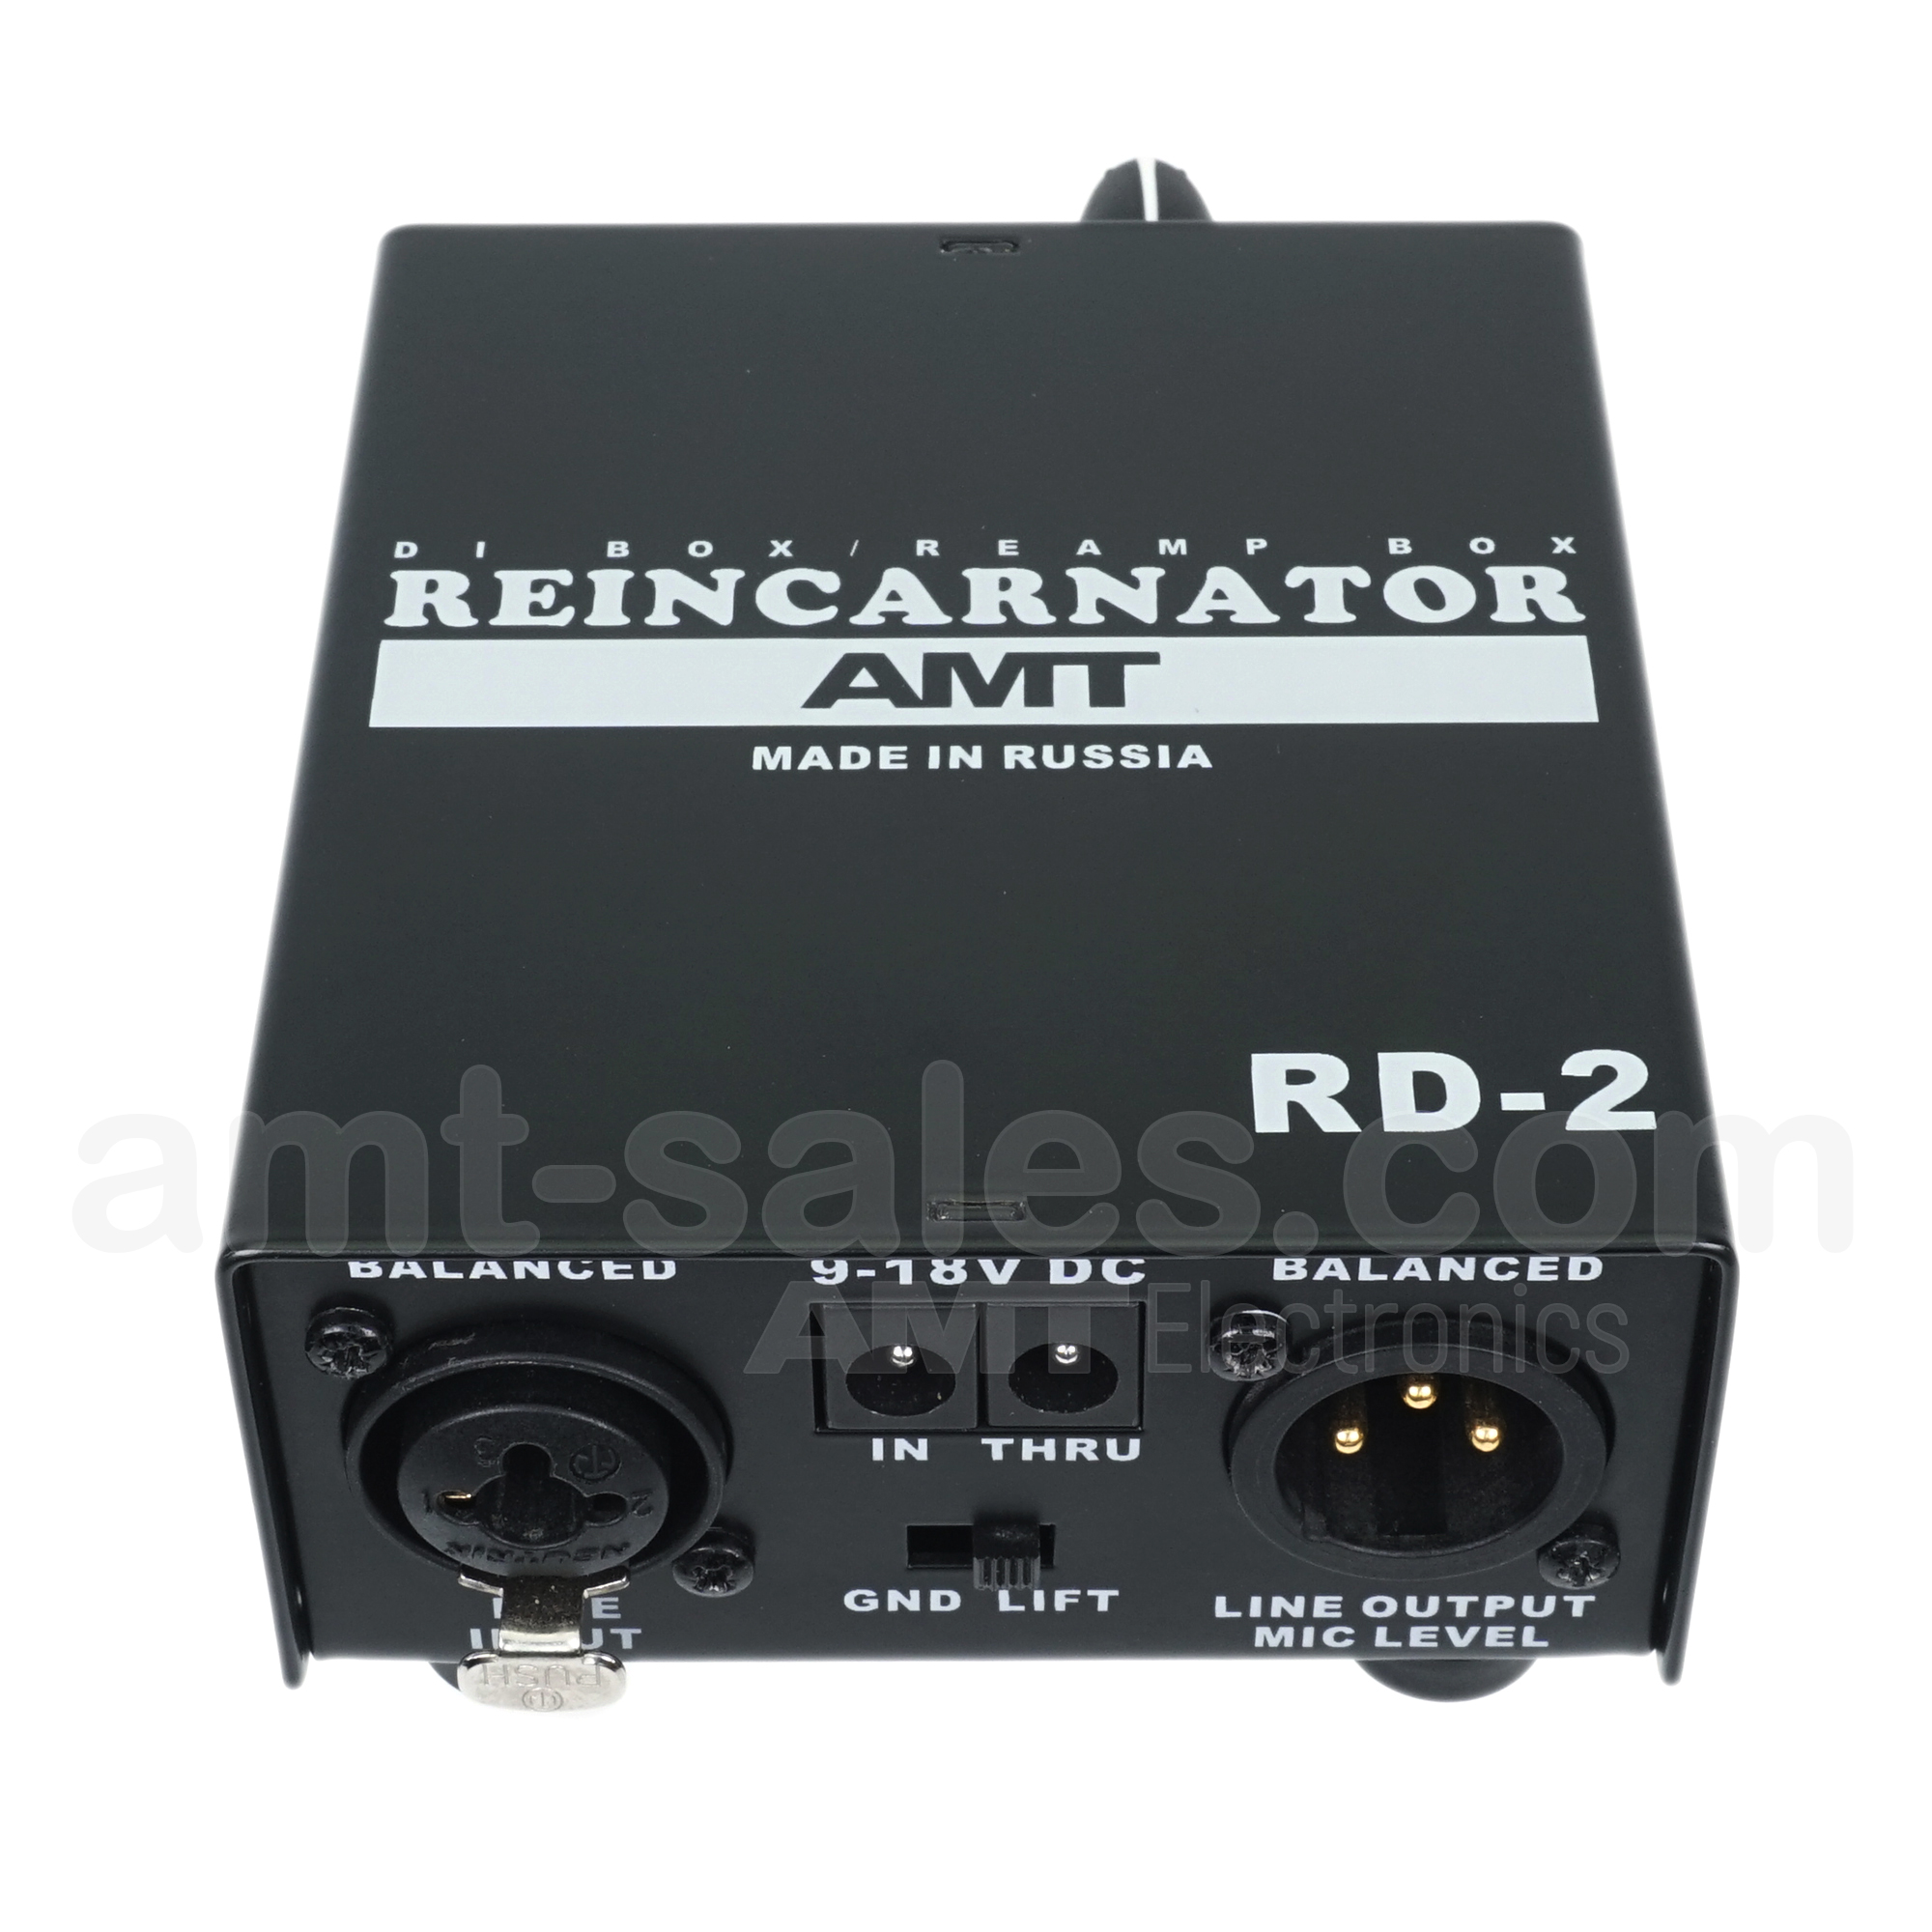 AMT Reincarnator RD-2 (DI-box + ReAmp-box)